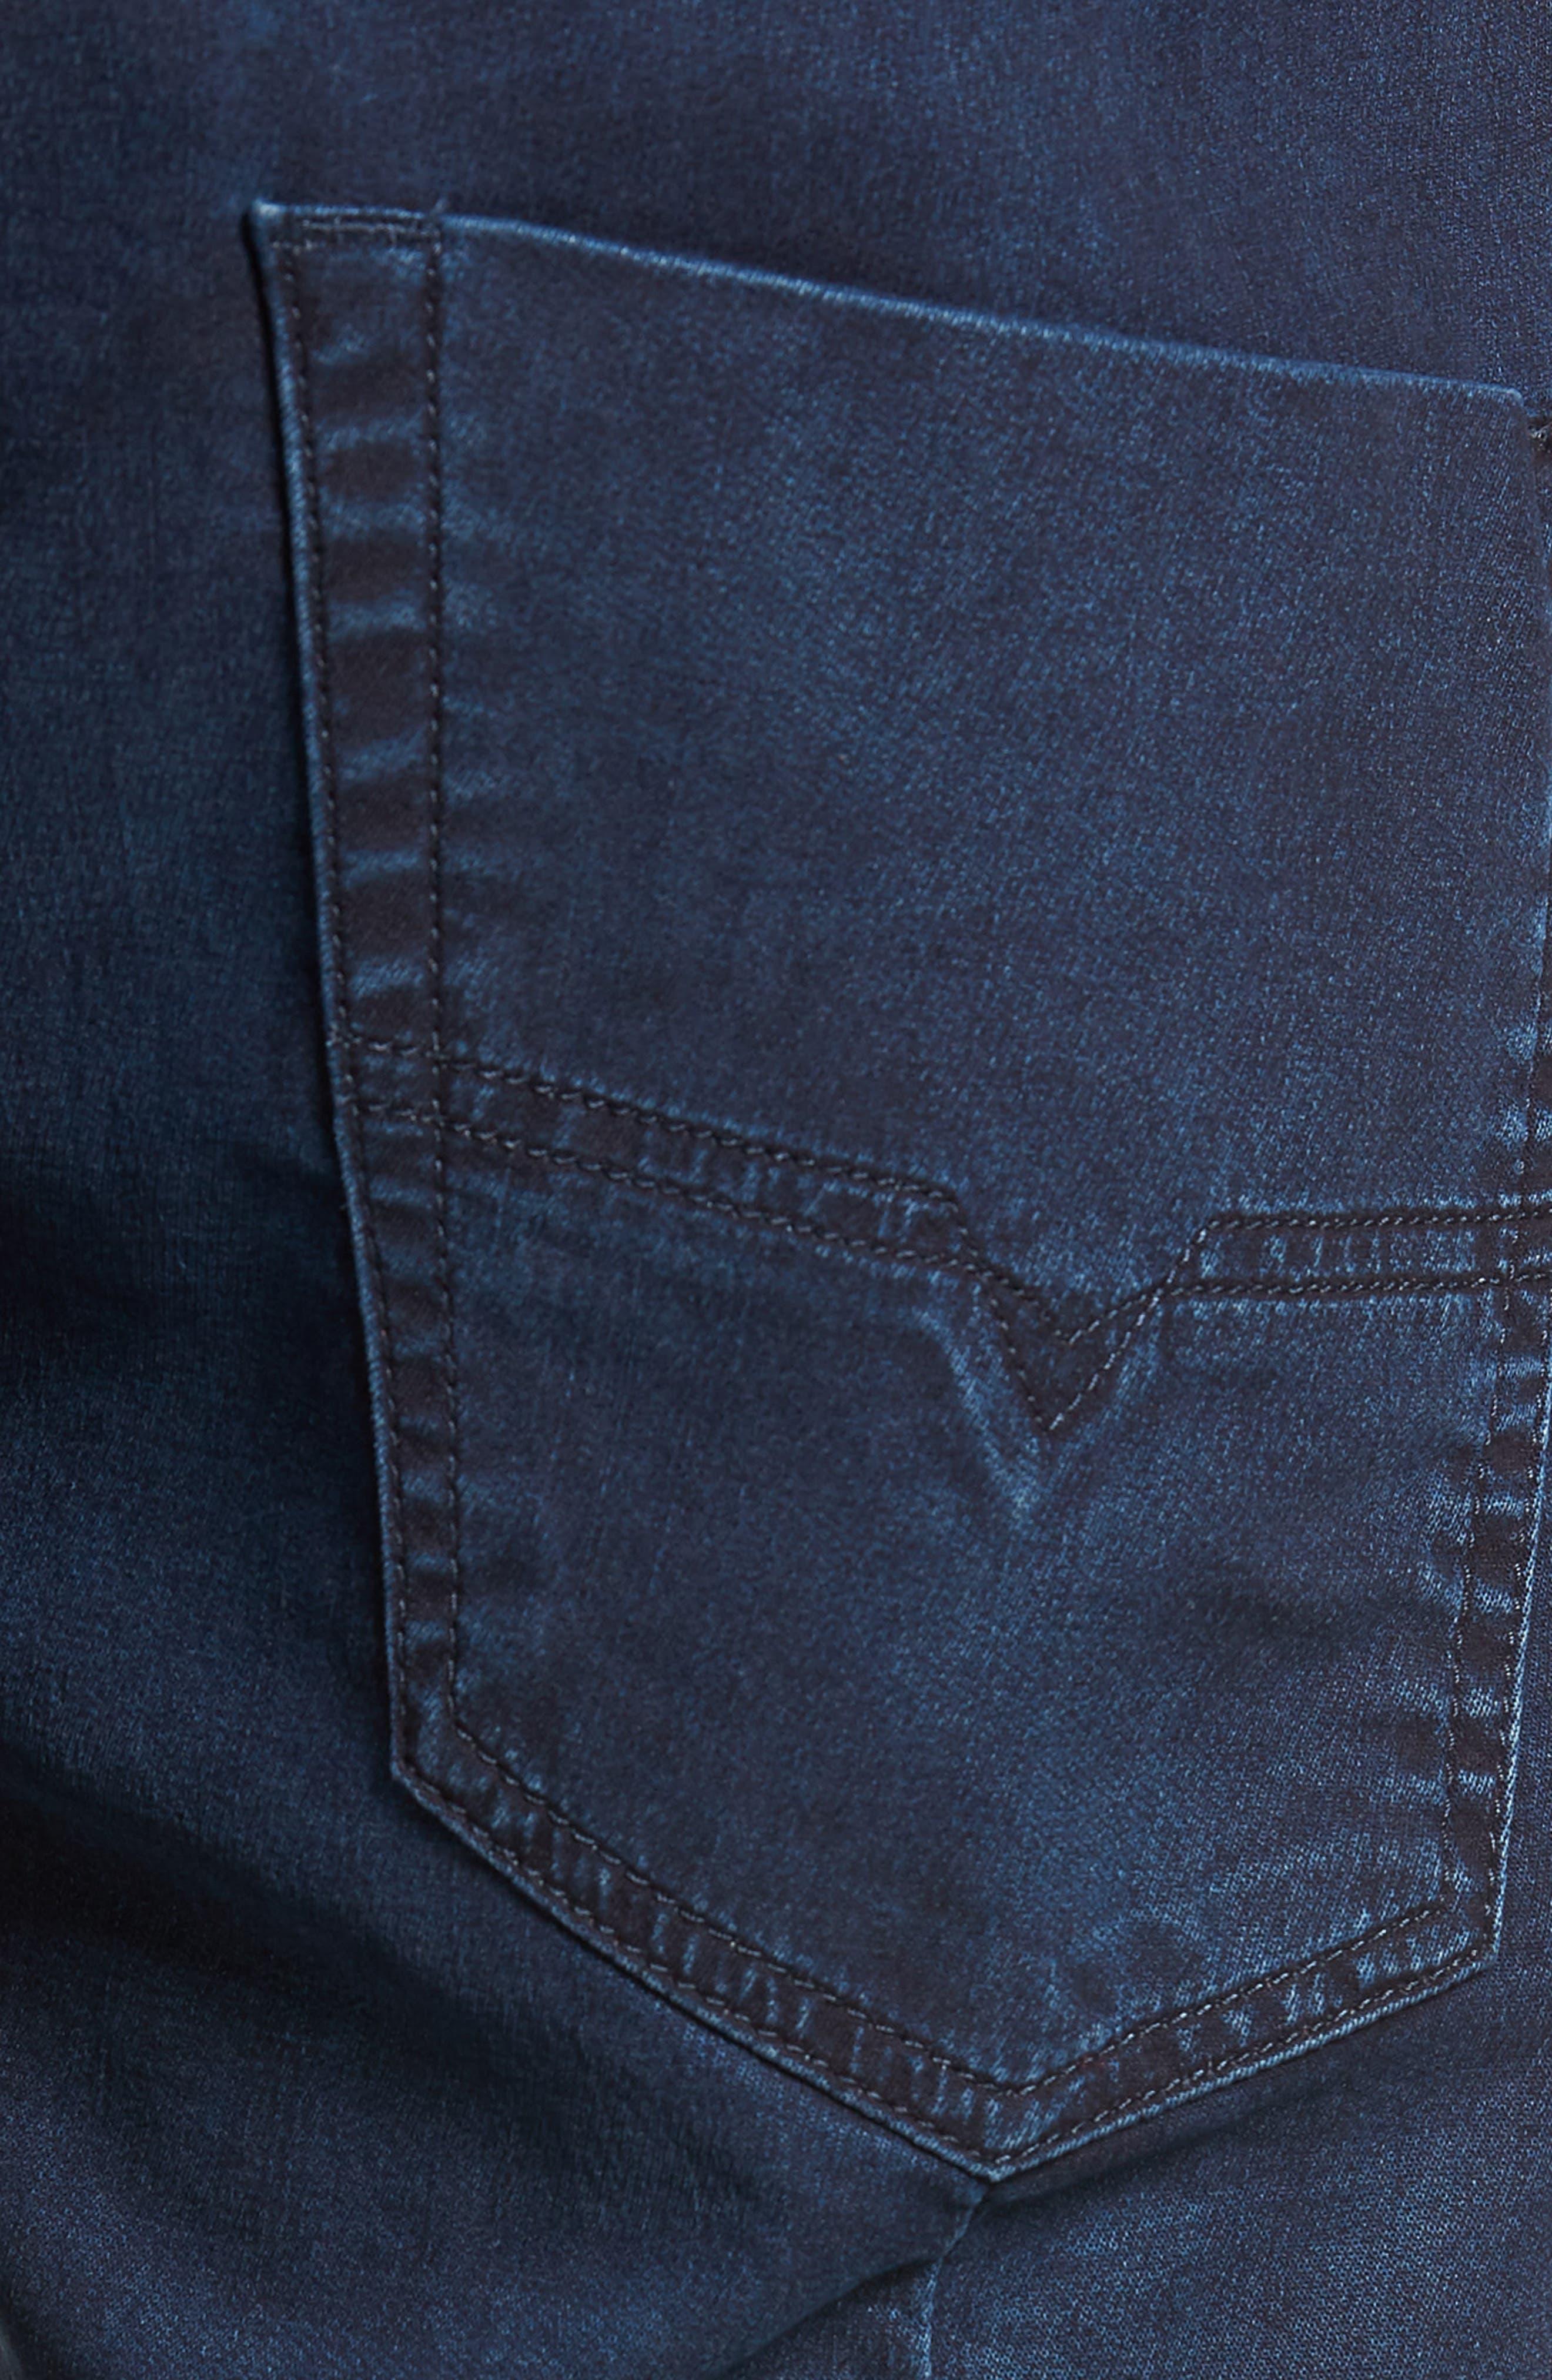 Krooshort Denim Shorts,                             Alternate thumbnail 5, color,                             0699C